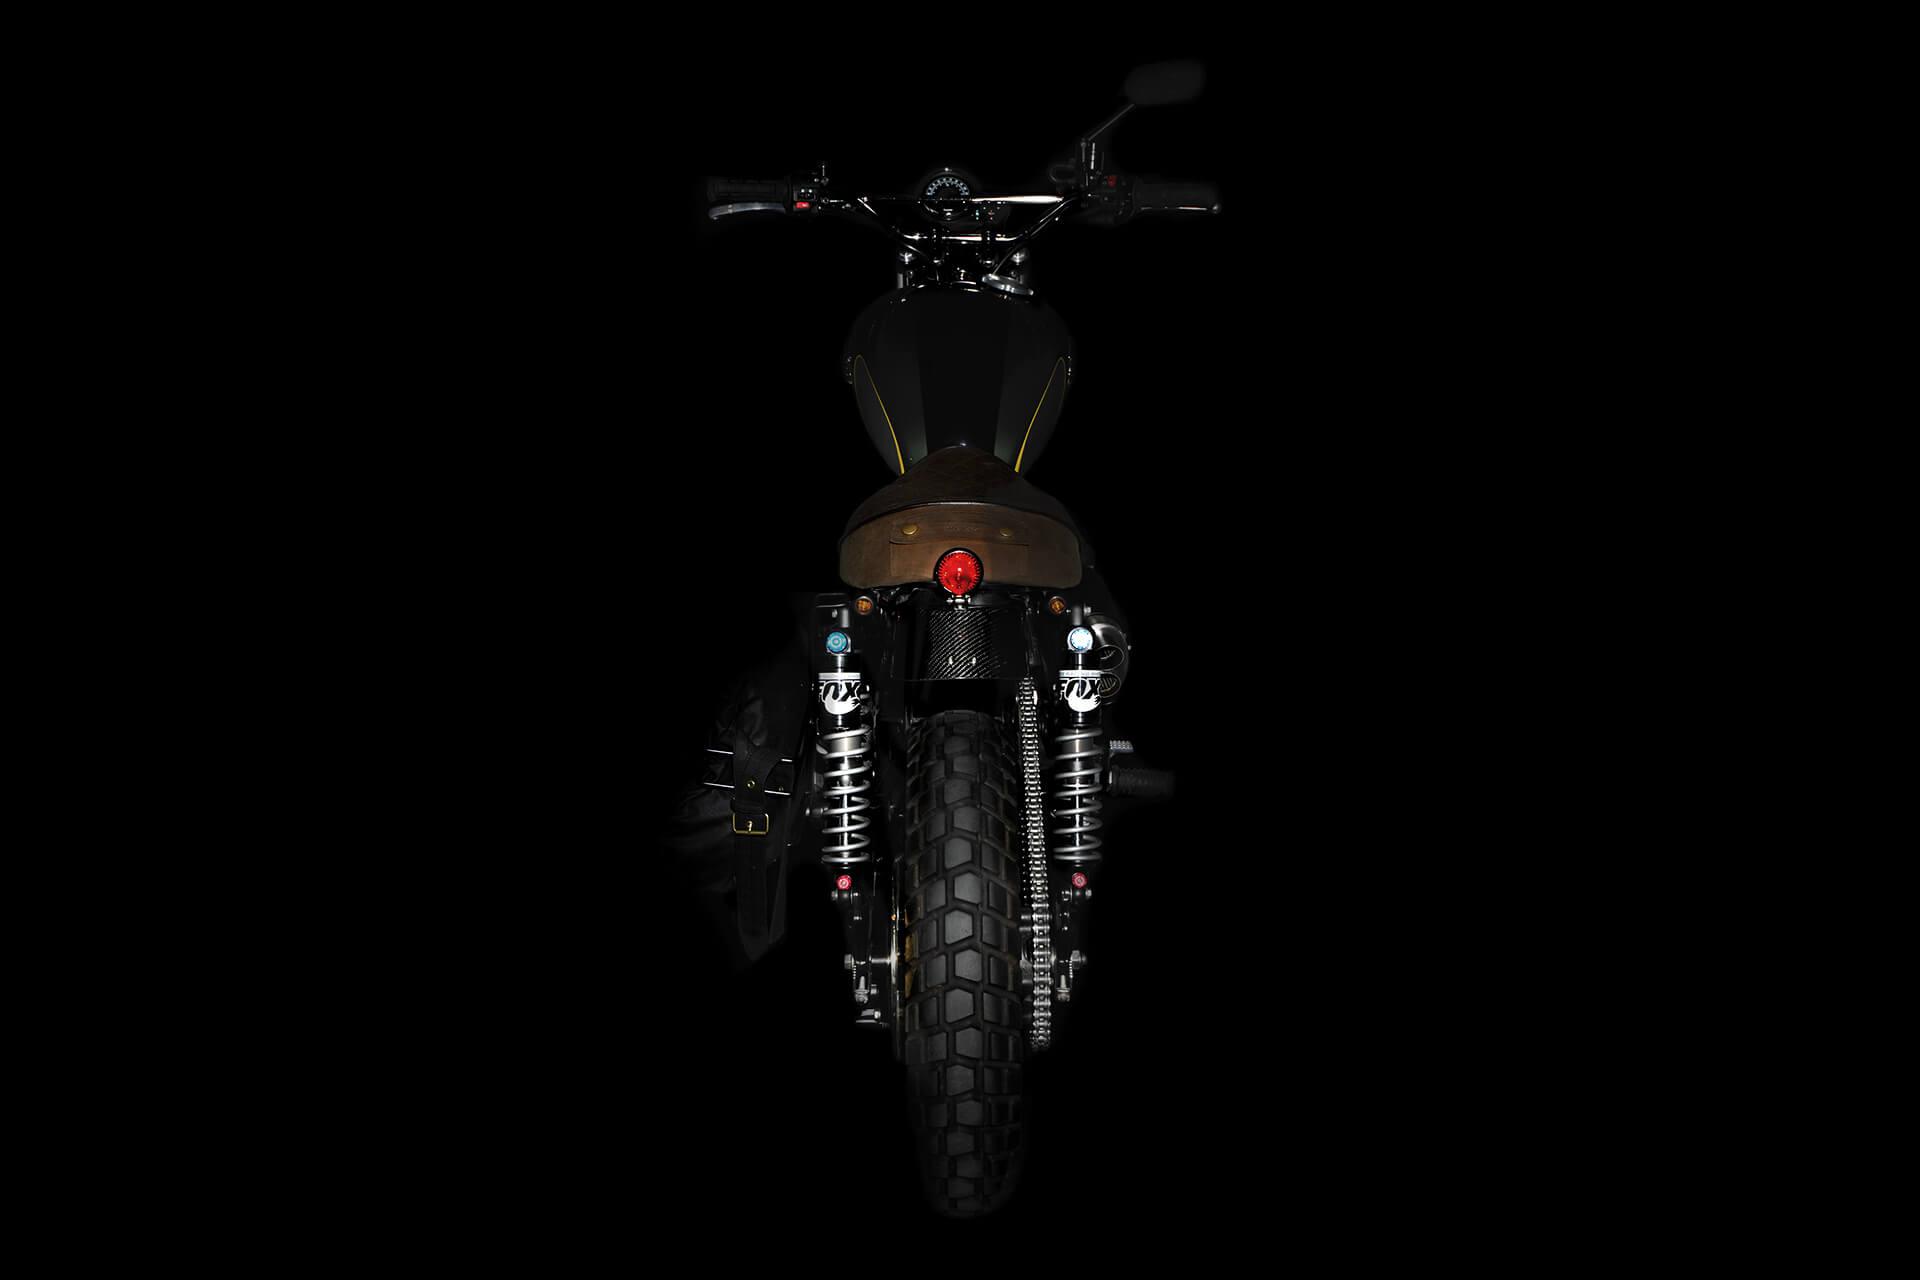 A225, Scrambler, Barbour, Barbour International, Britain, British, Photography, Film, WeAreShuffle, Biker, Motorcycle, Leather, Breaks, Break Discs, Triumph, Rear